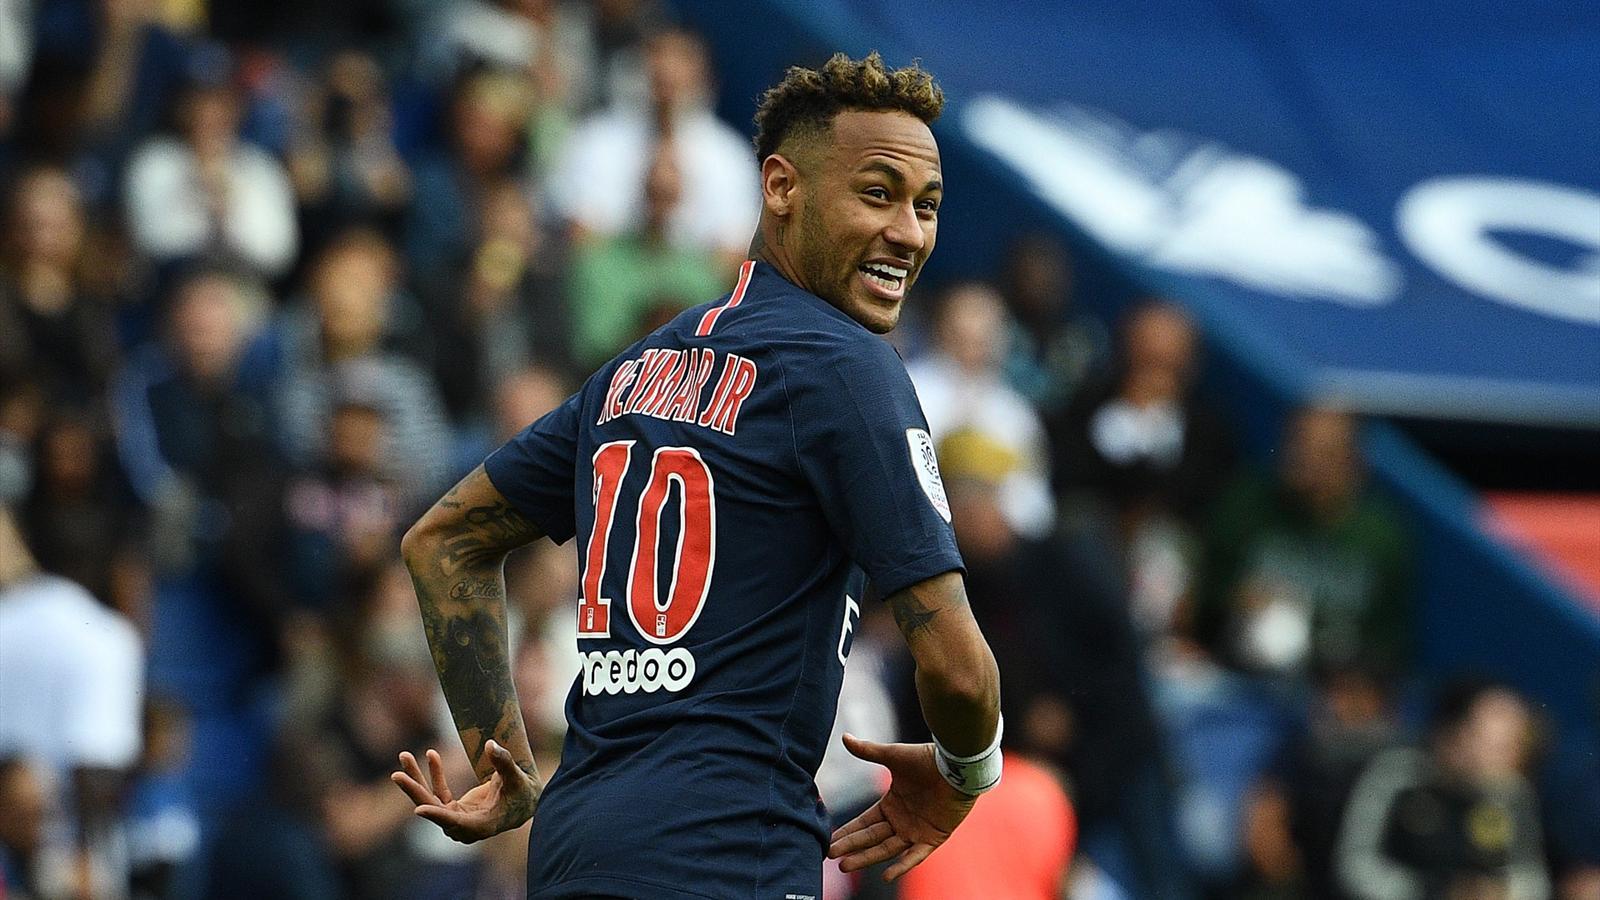 Neymar: Man City Will Win The League, Liverpool Won't Make